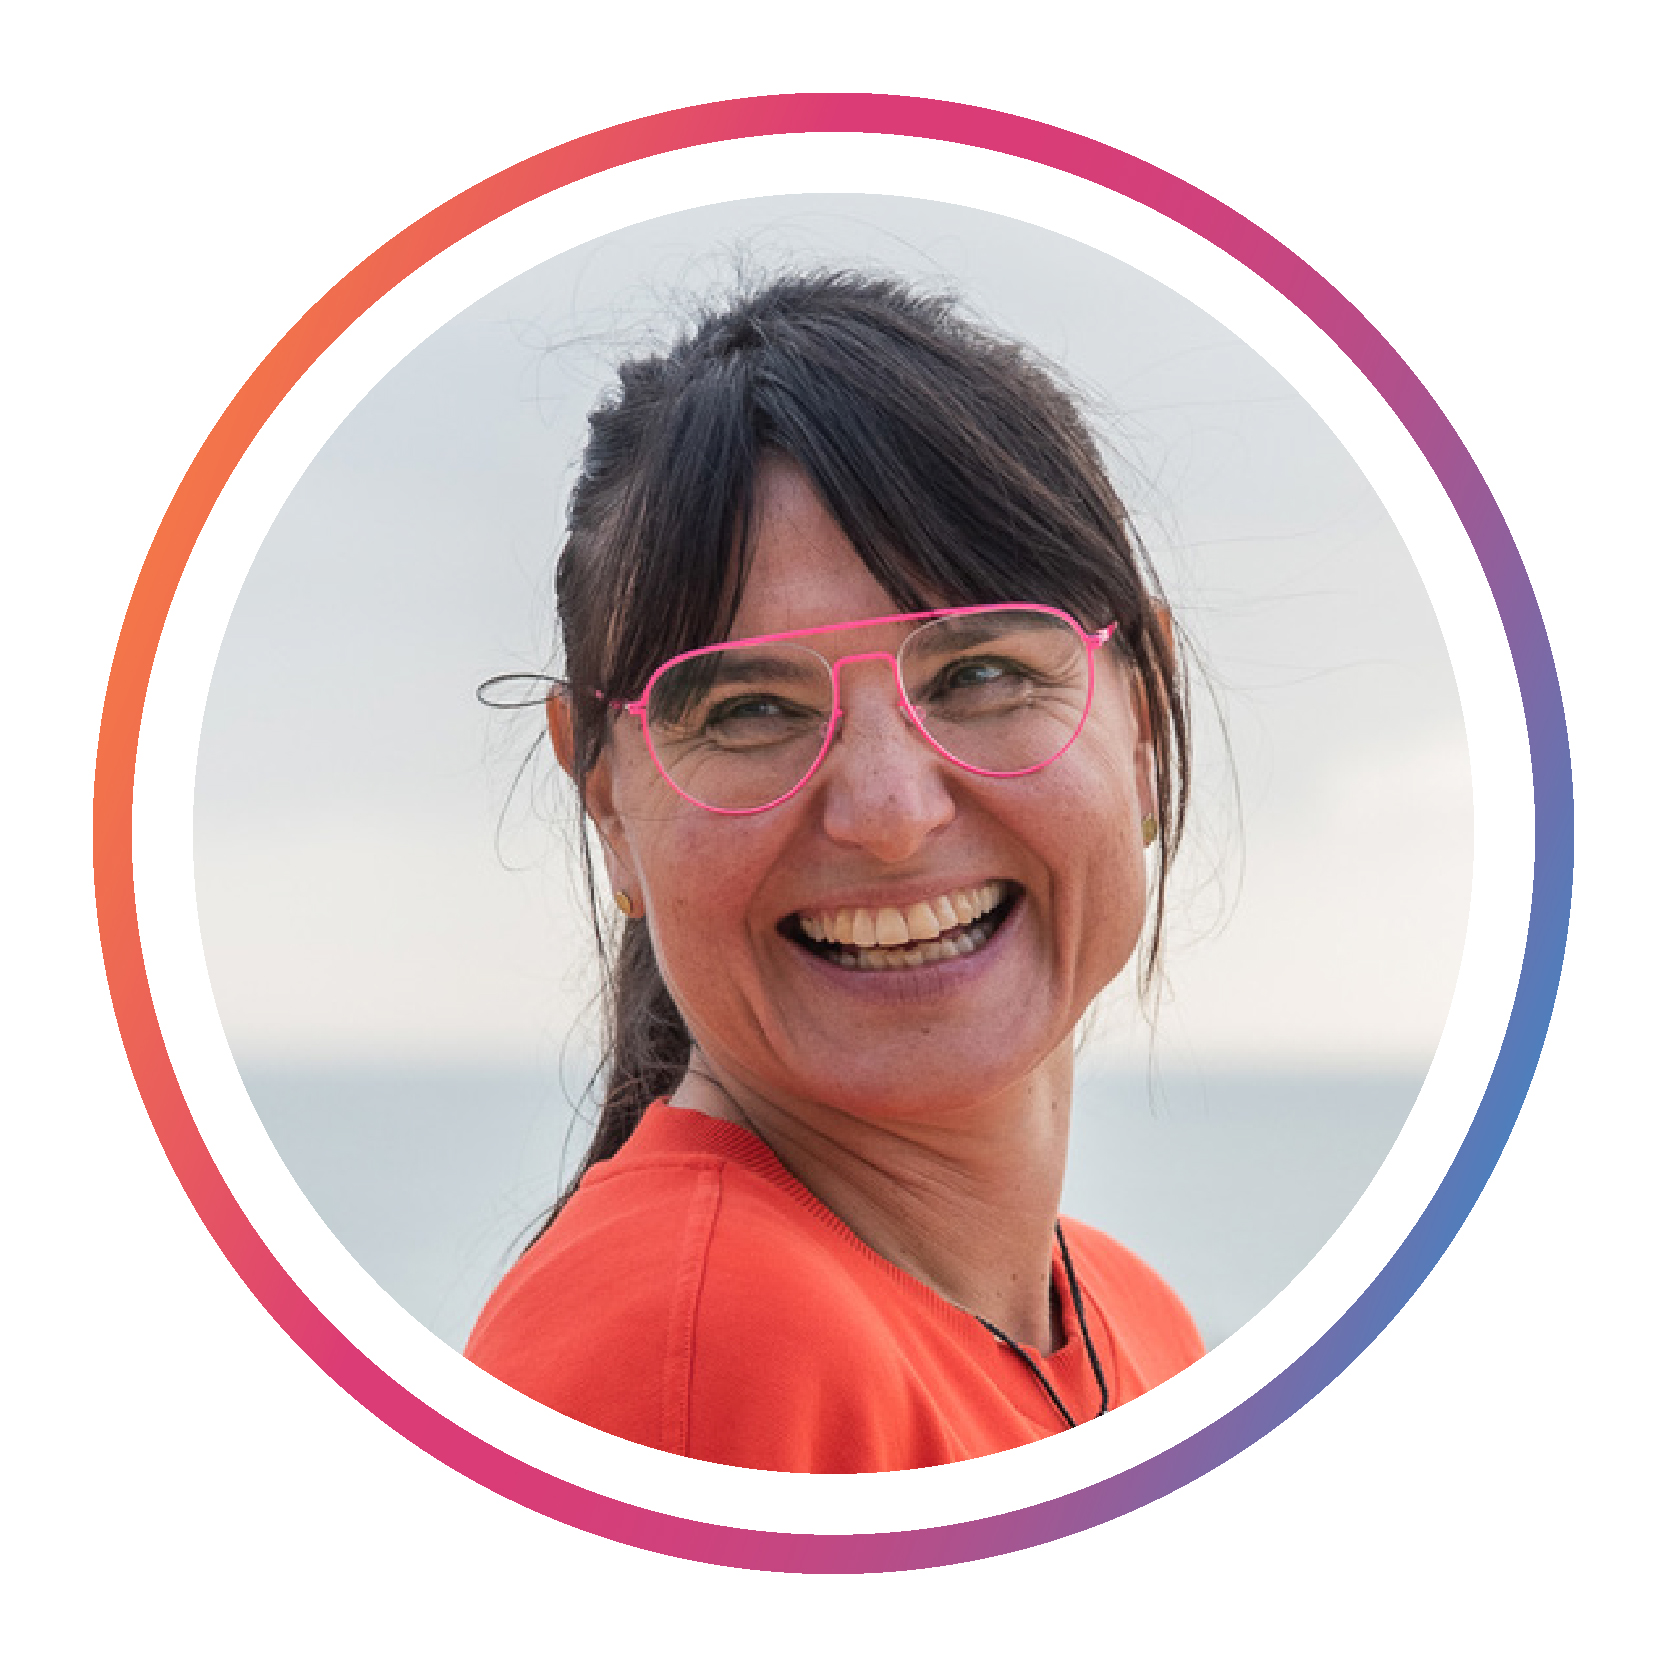 Sabine Seymour | IoT, Sensors & Data Expert